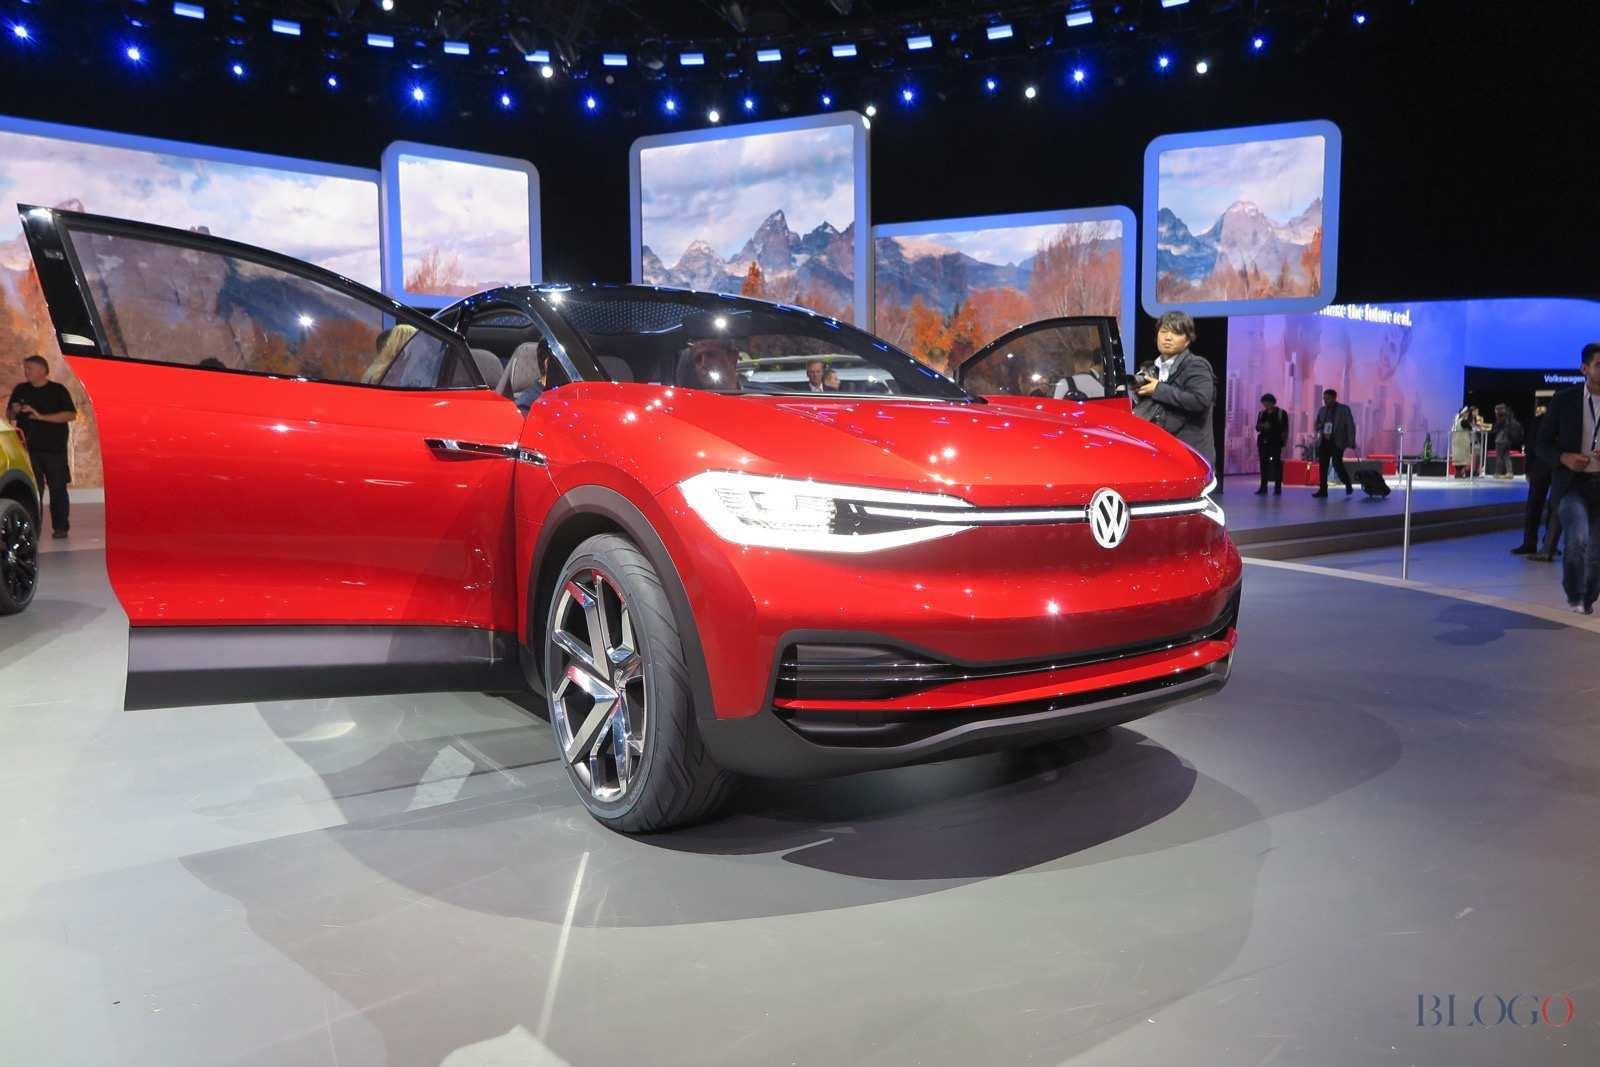 57 All New Volkswagen Elettrica 2020 Pricing with Volkswagen Elettrica 2020